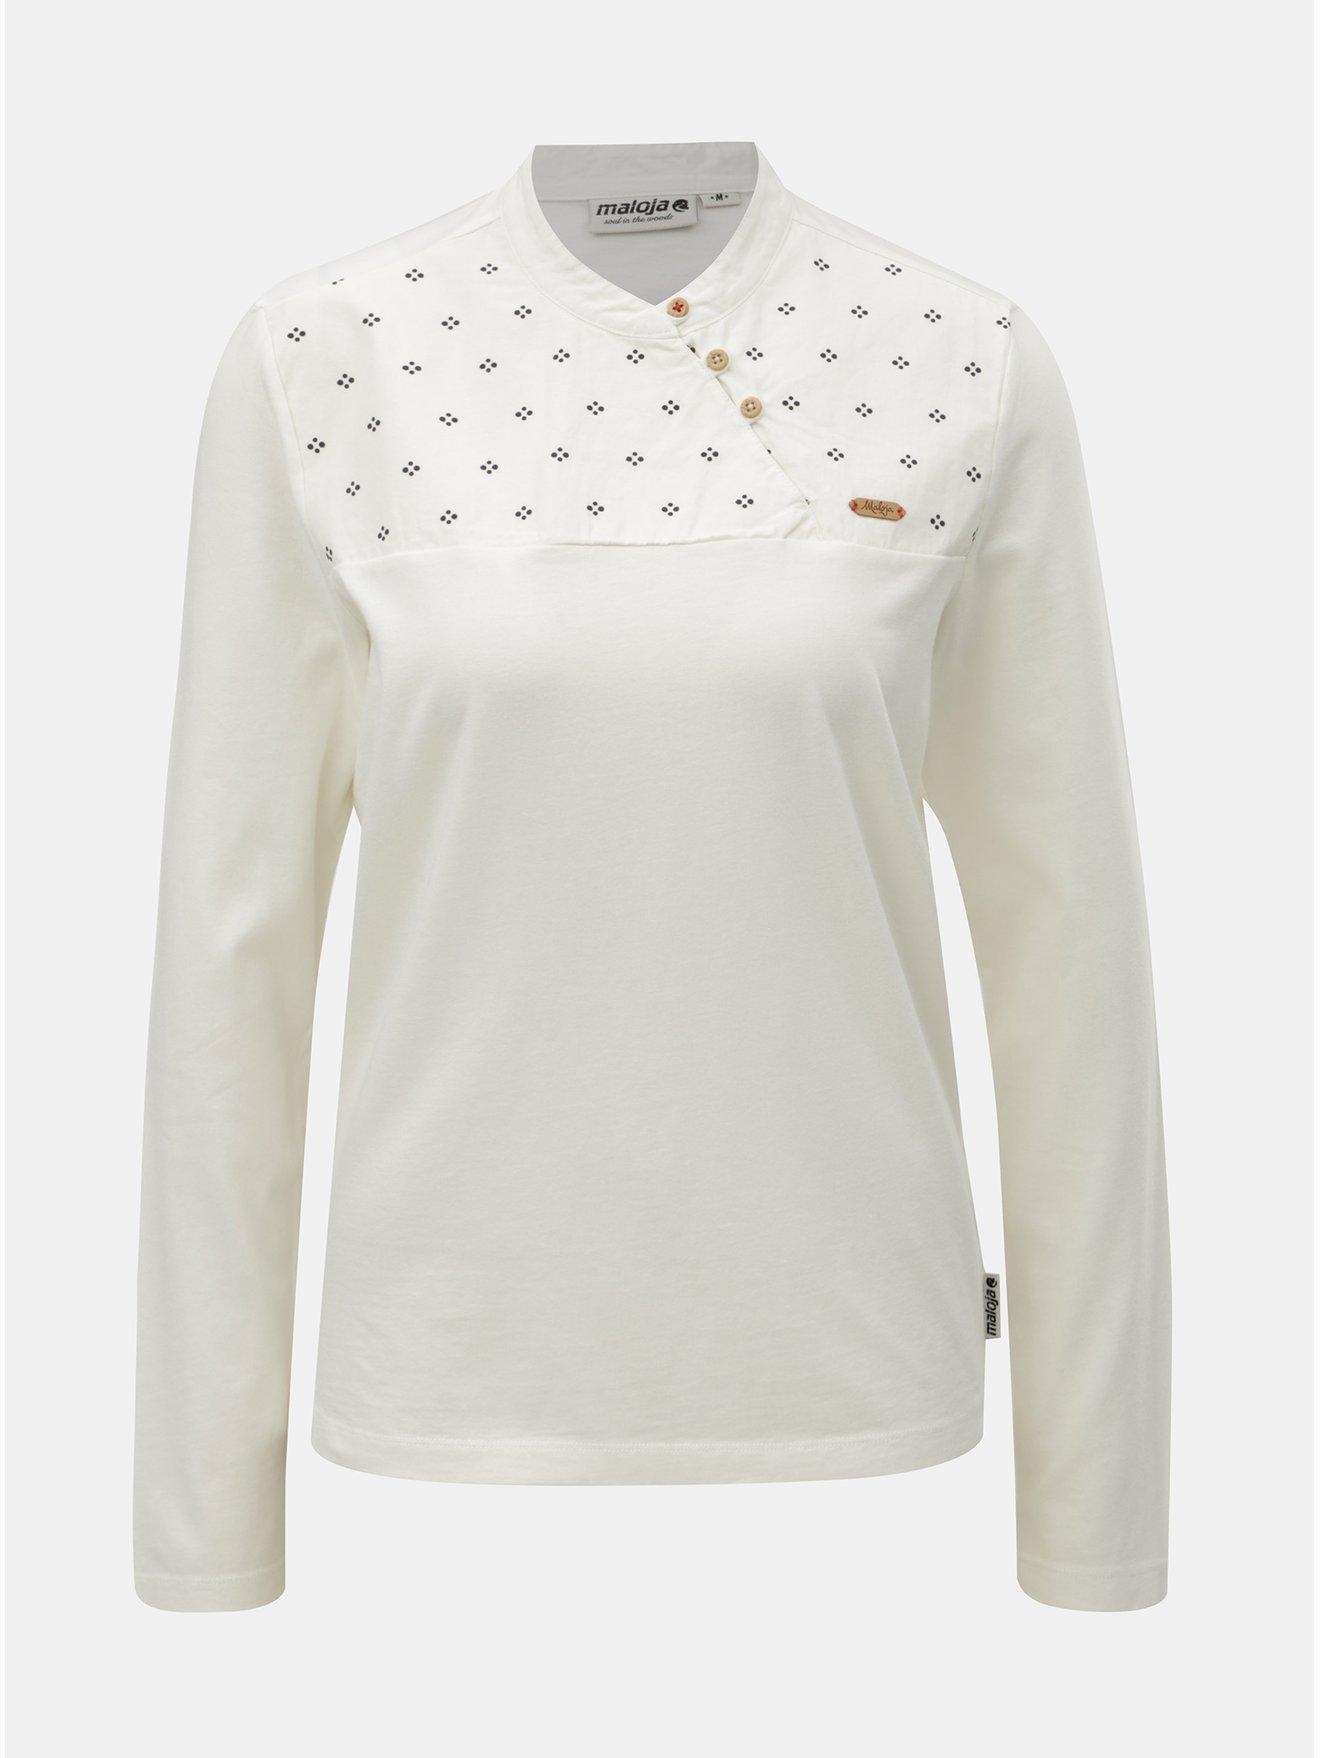 Fotografie Krémové dámské tričko s knoflíky a dlouhým rukávem Maloja Vauglia